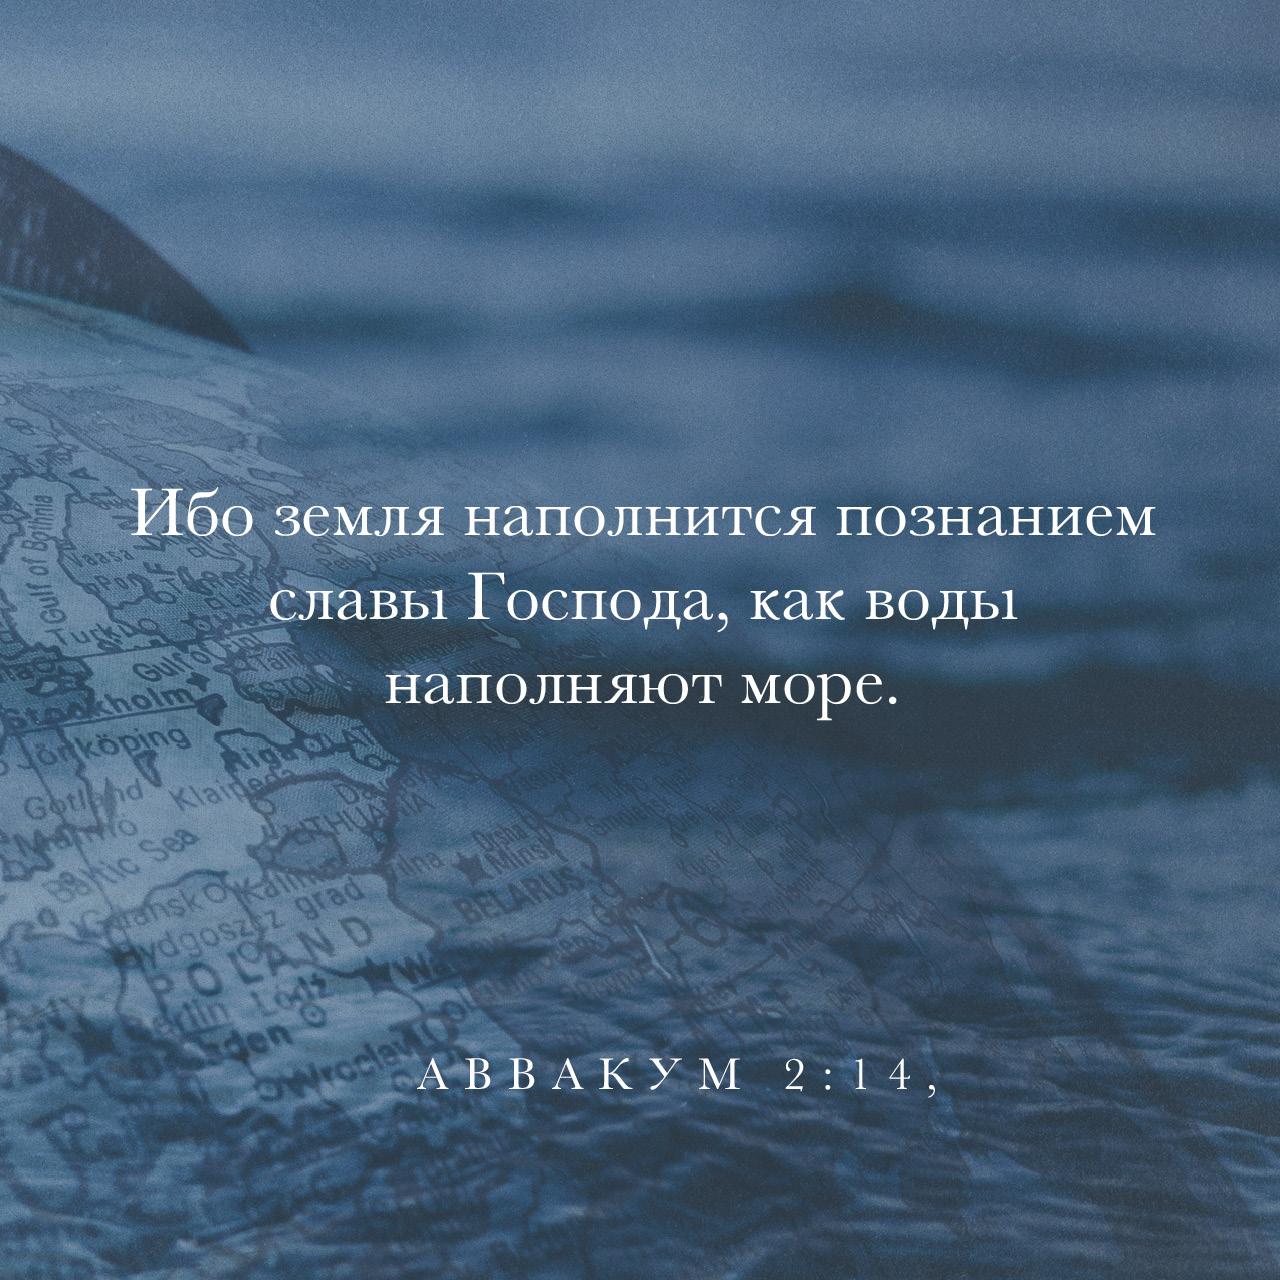 Habakkuk2_14_Color